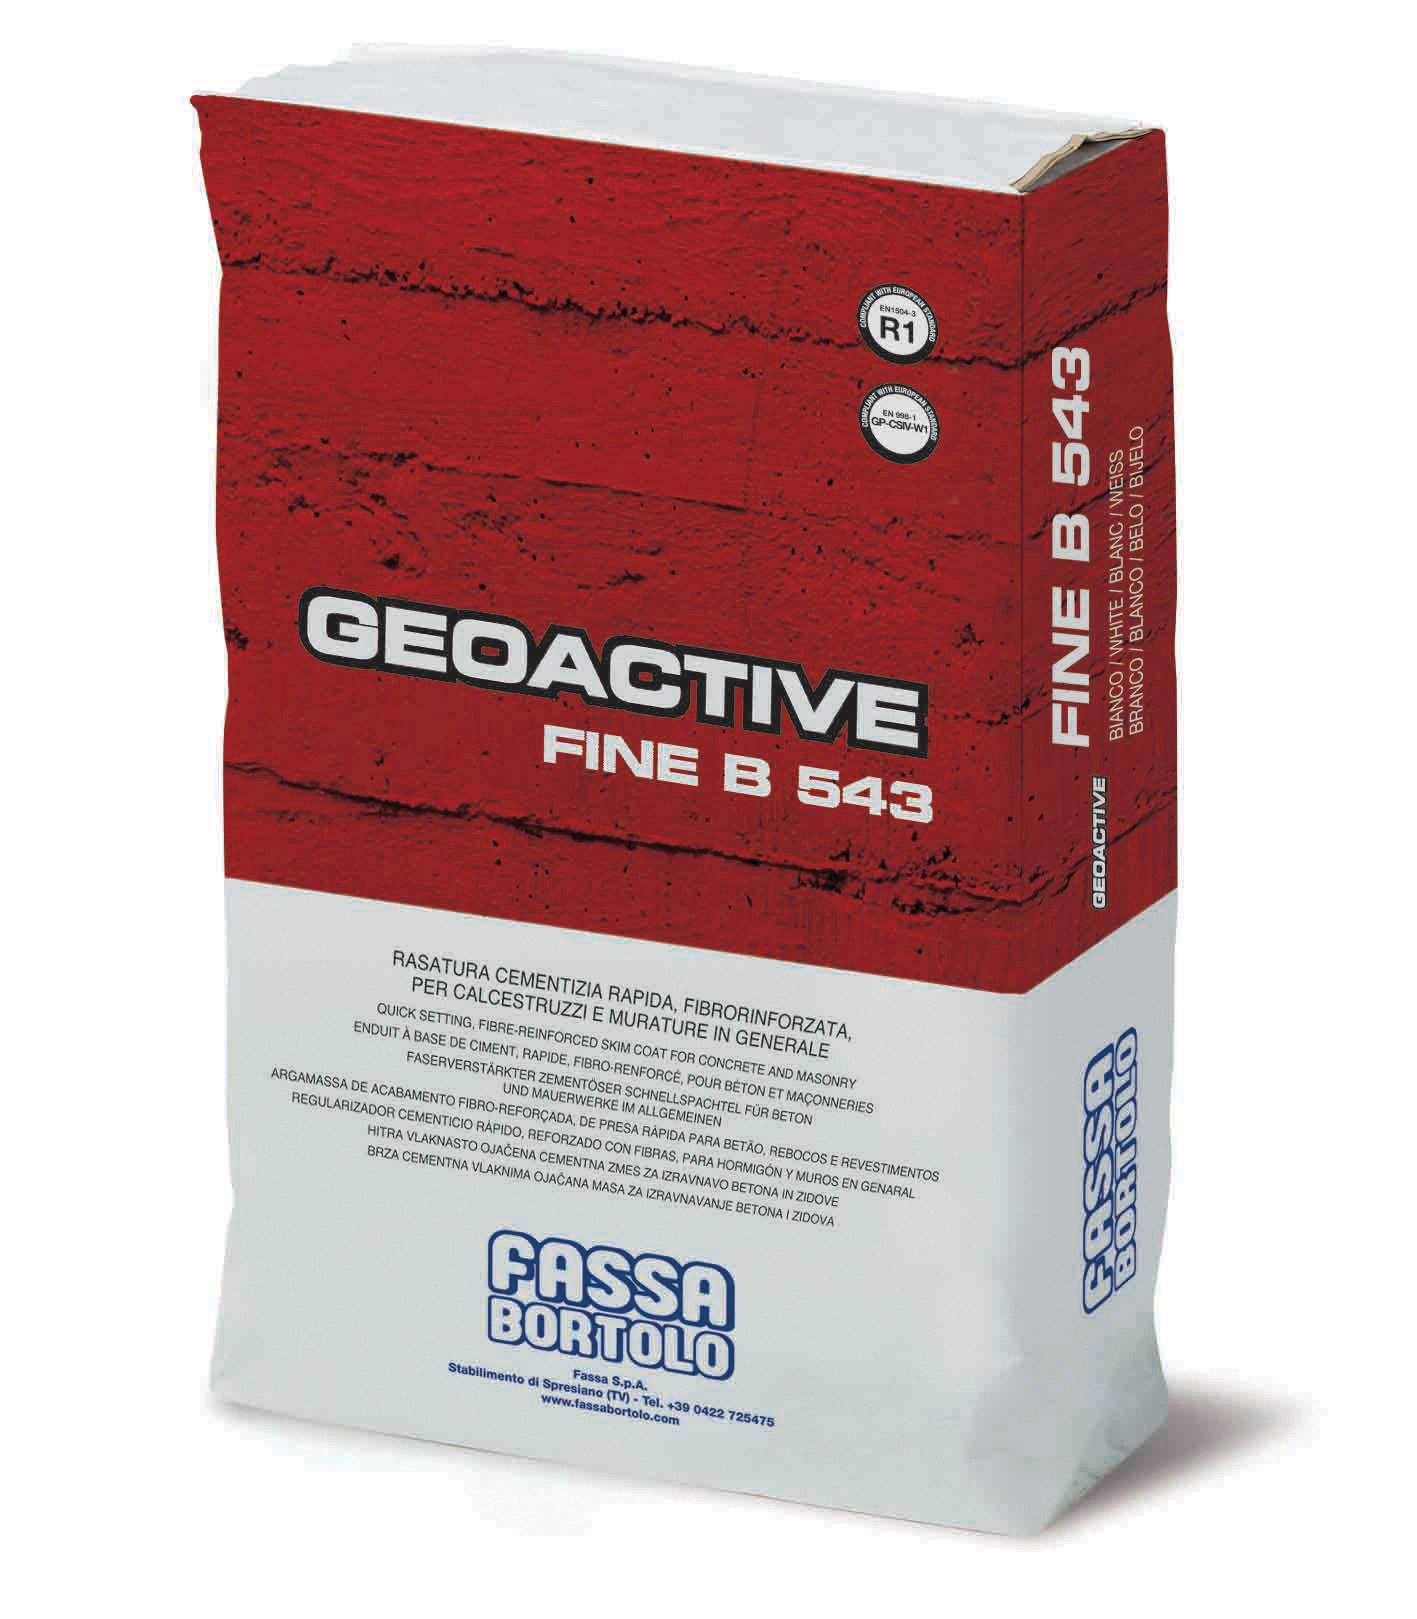 GEOACTIVE FINE B 543